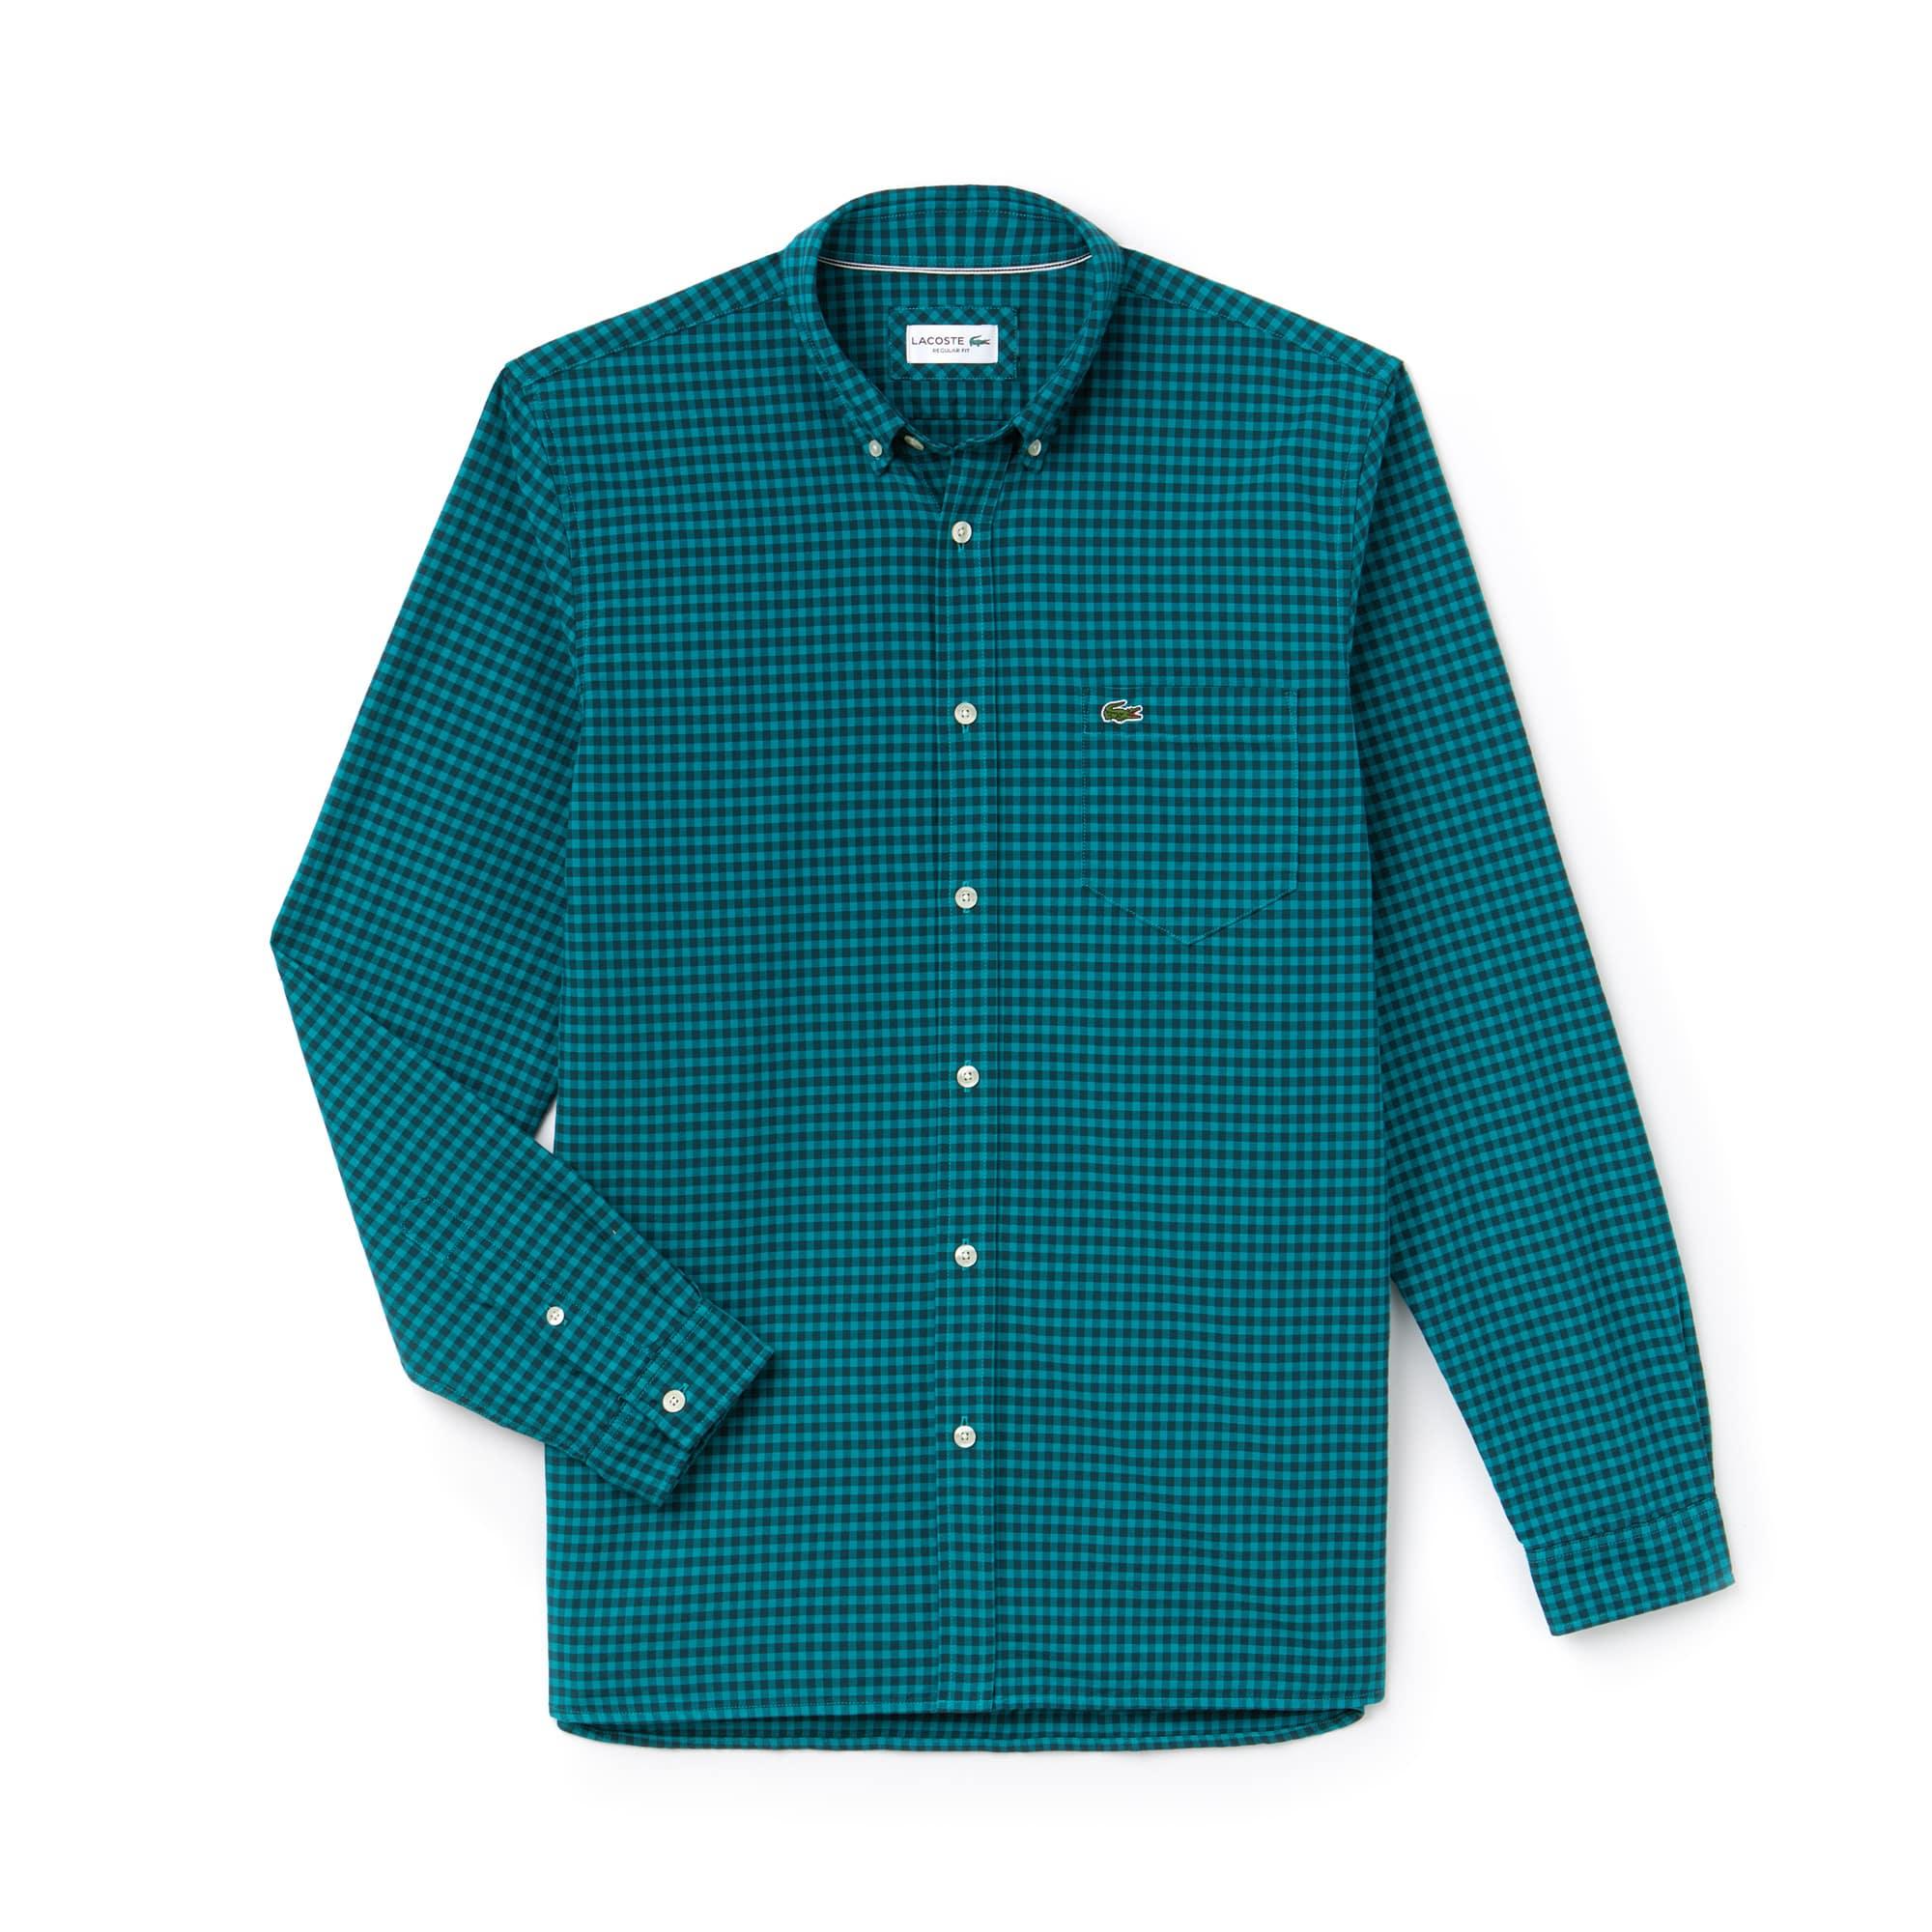 Men's Regular Fit Gingham Oxford Cotton Shirt